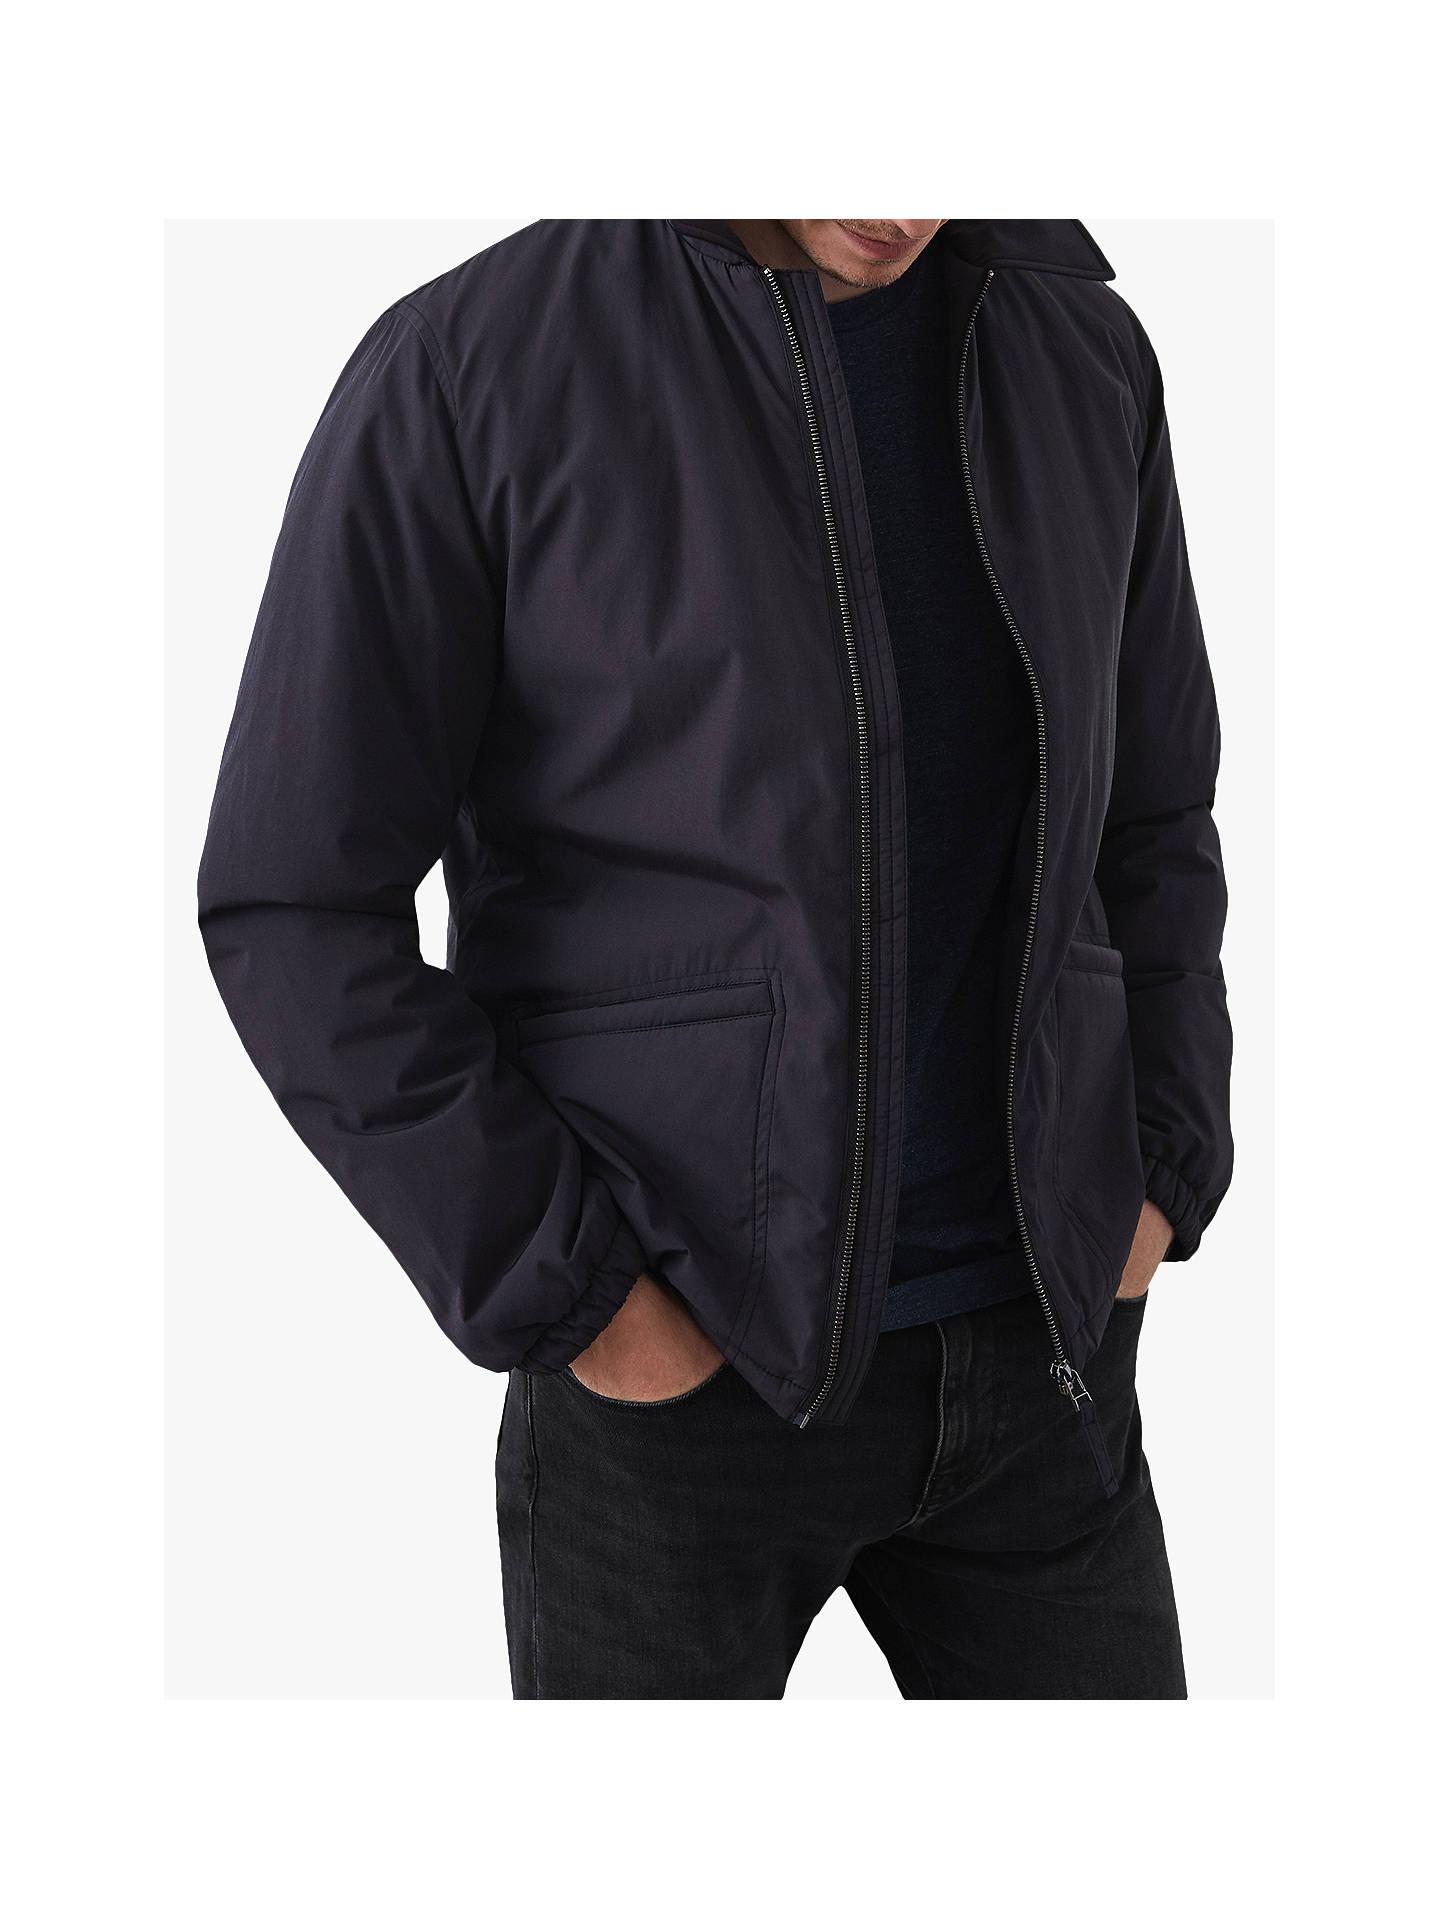 e21bb06af Reiss Herman Wadded Bomber Jacket, Dark Grey at John Lewis & Partners